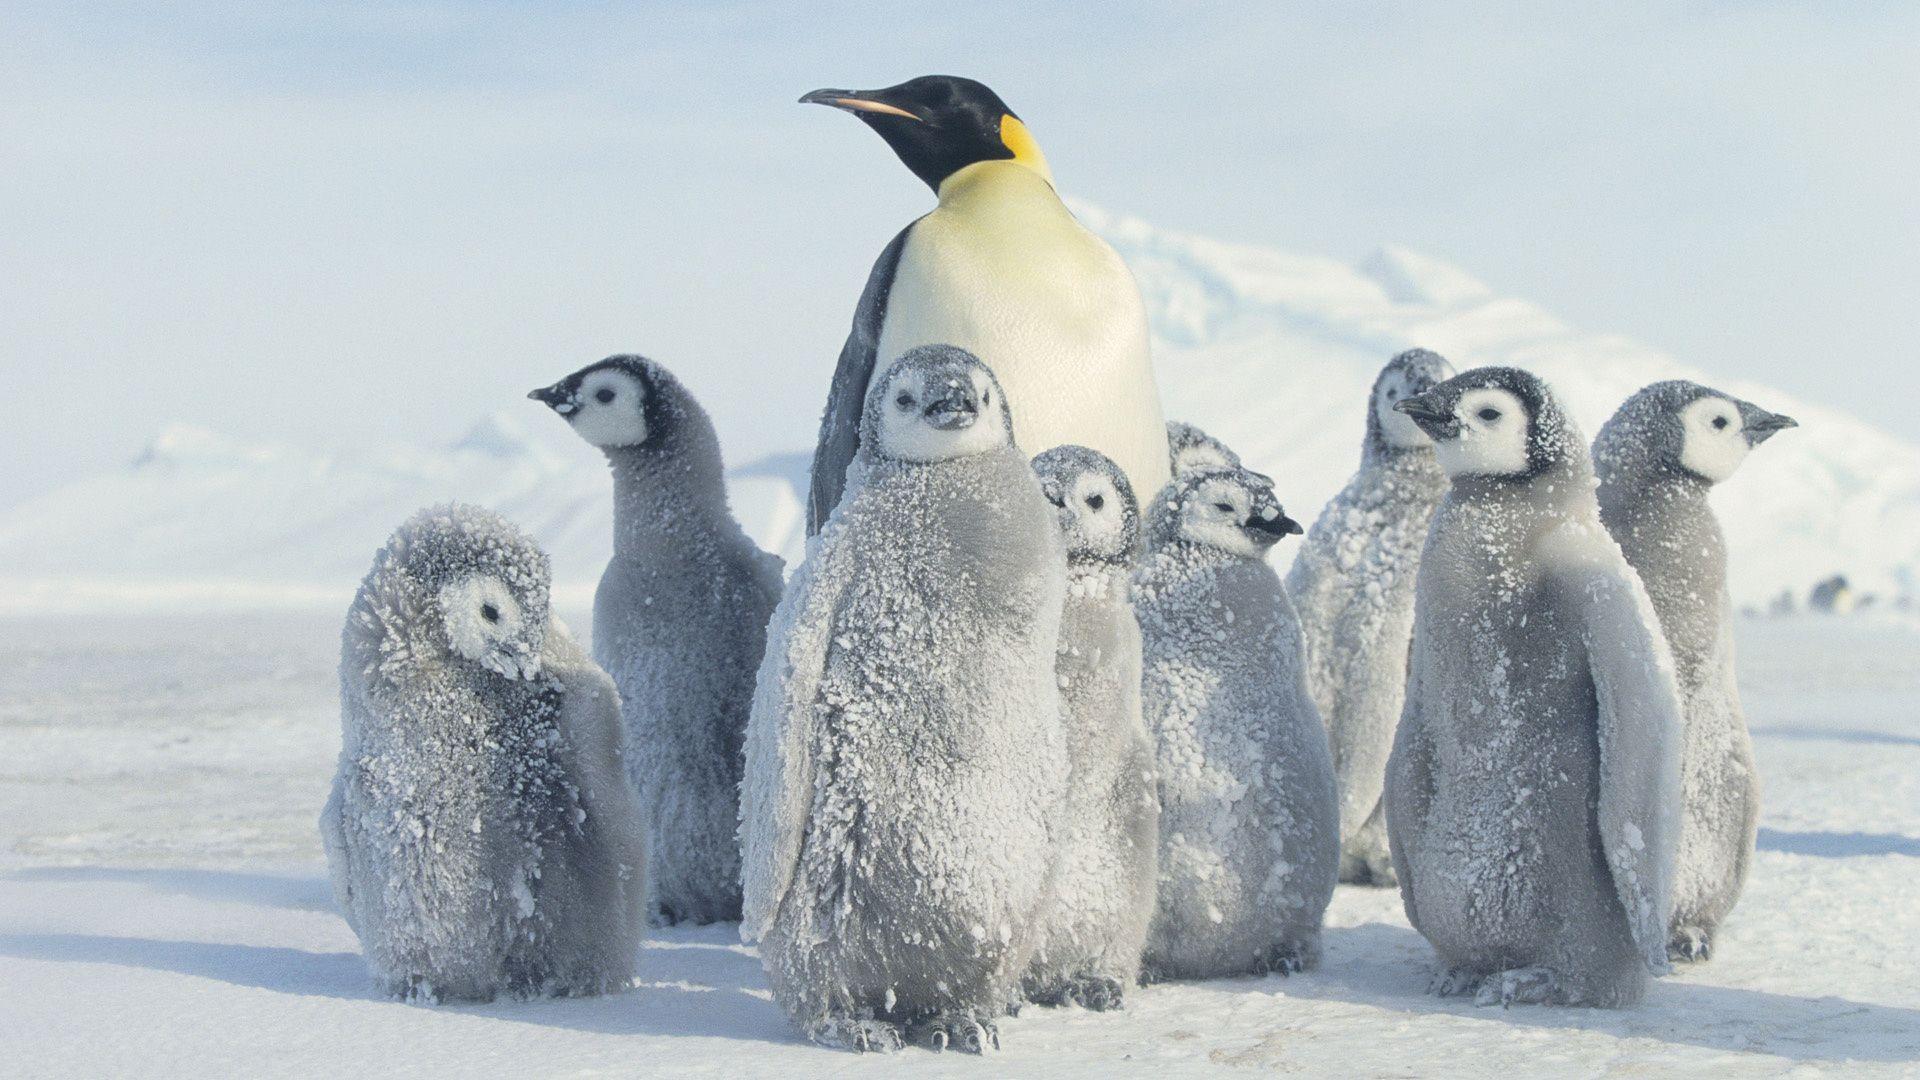 Pin By Mark On Arcticitcra Penguin Wallpaper Penguins Pet Birds